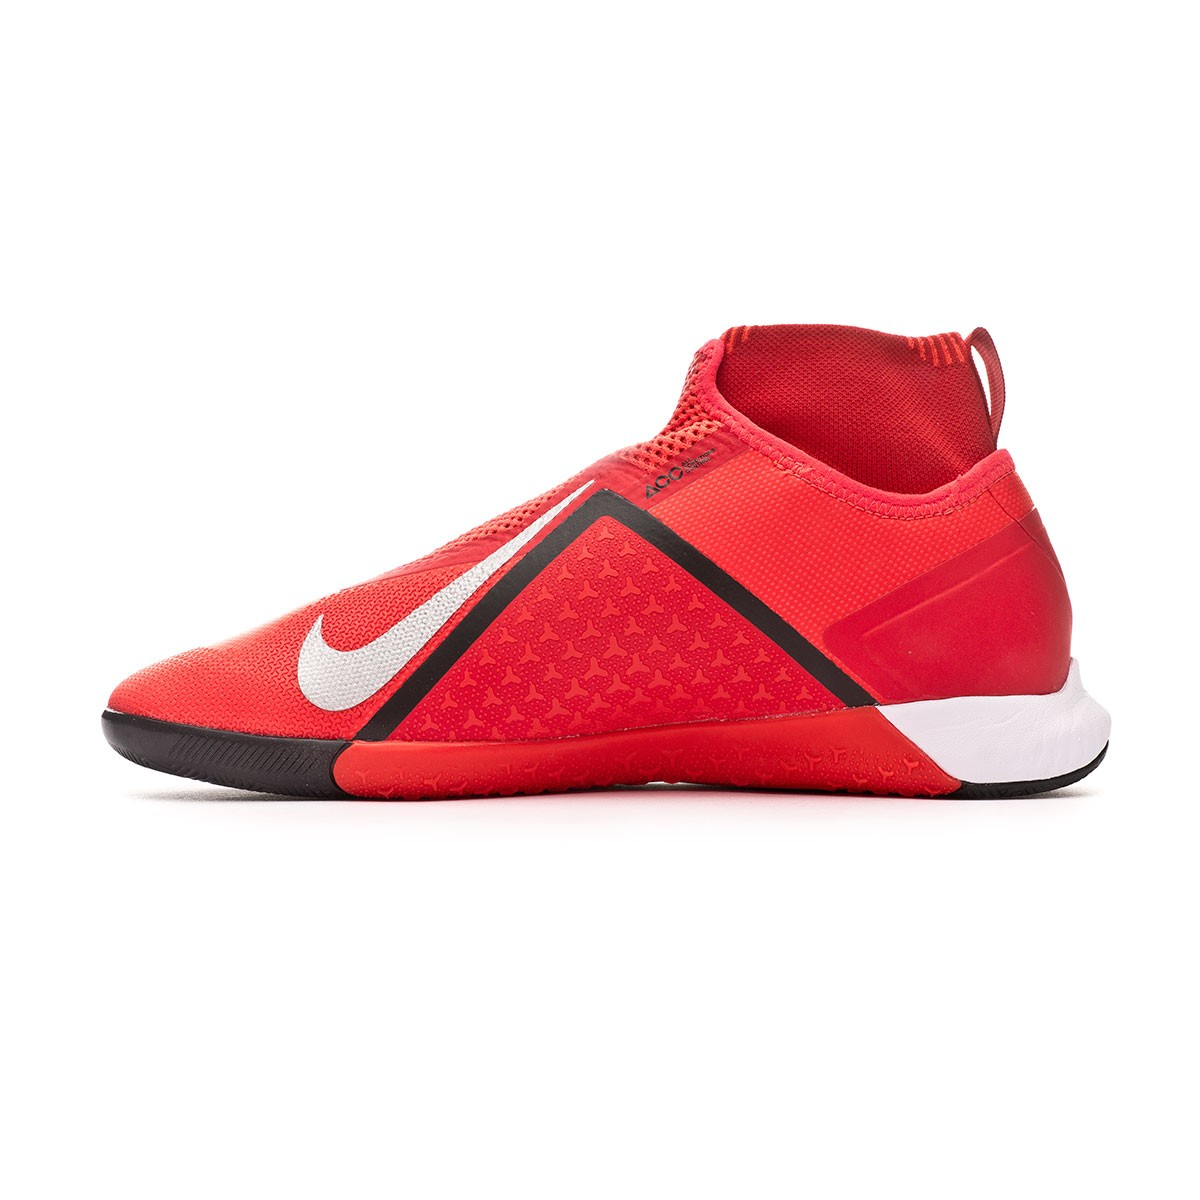 5a4088ac384 Futsal Boot Nike React Phantom Vision Pro DF IC Bright crimson-Metallic  silver - Football store Fútbol Emotion